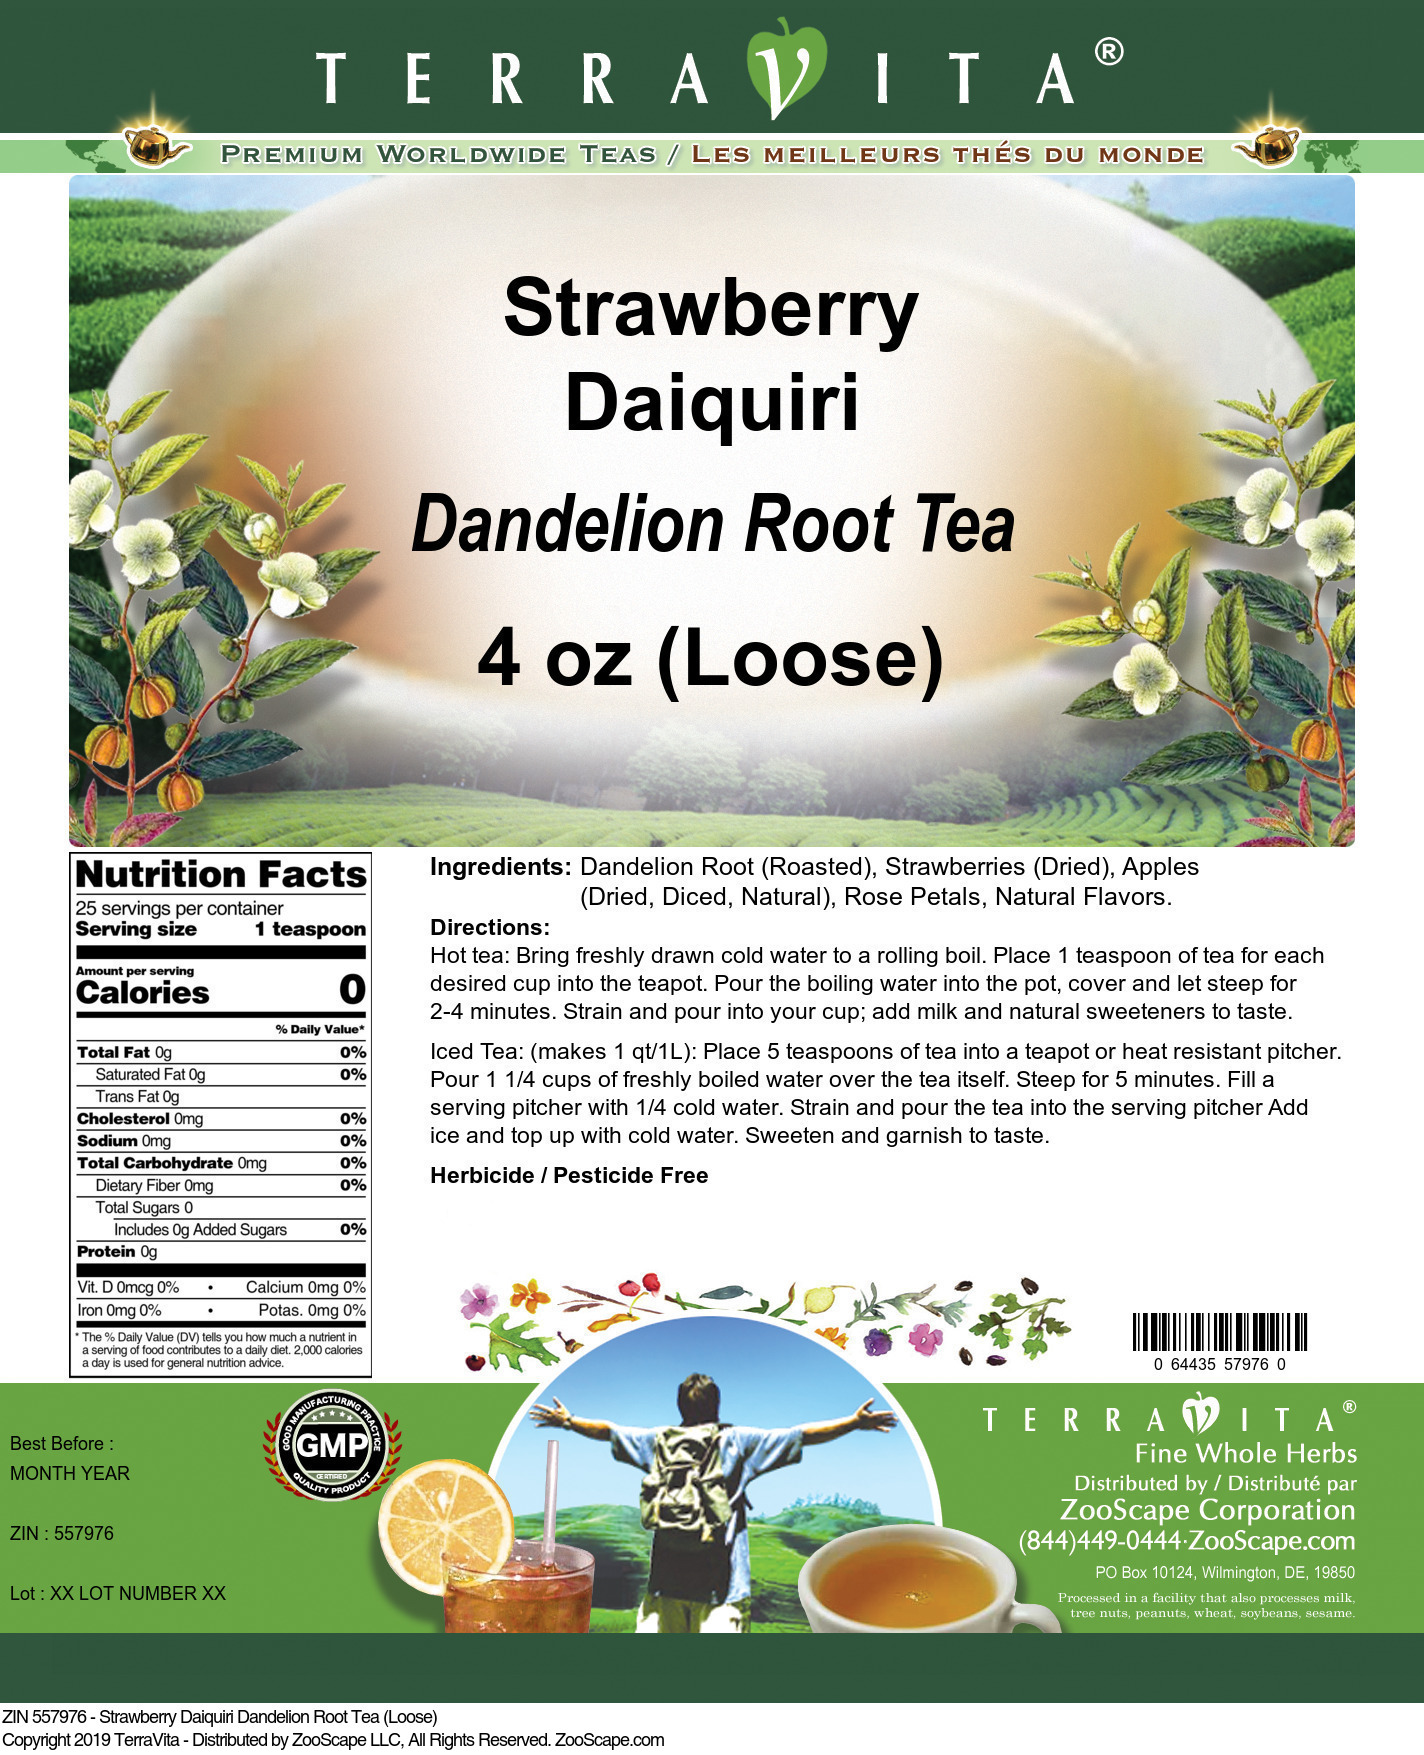 Strawberry Daiquiri Dandelion Root Tea (Loose)